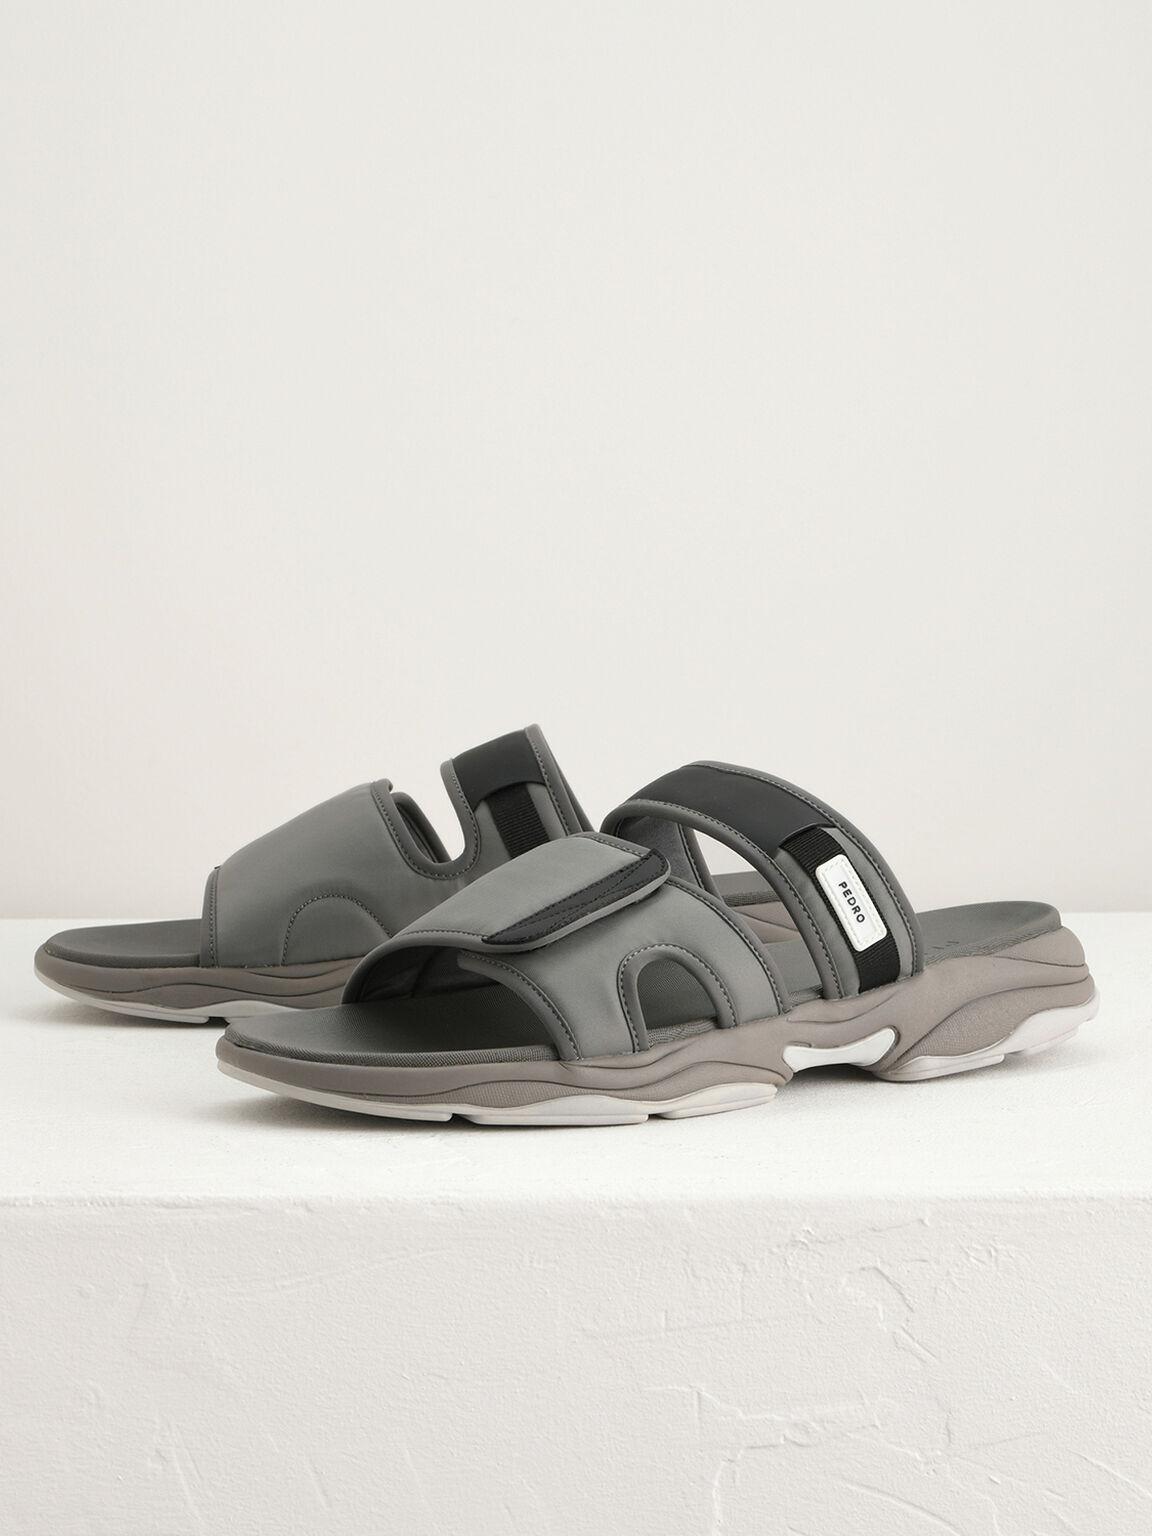 Double Strap Velcro Sandals, Light Grey, hi-res